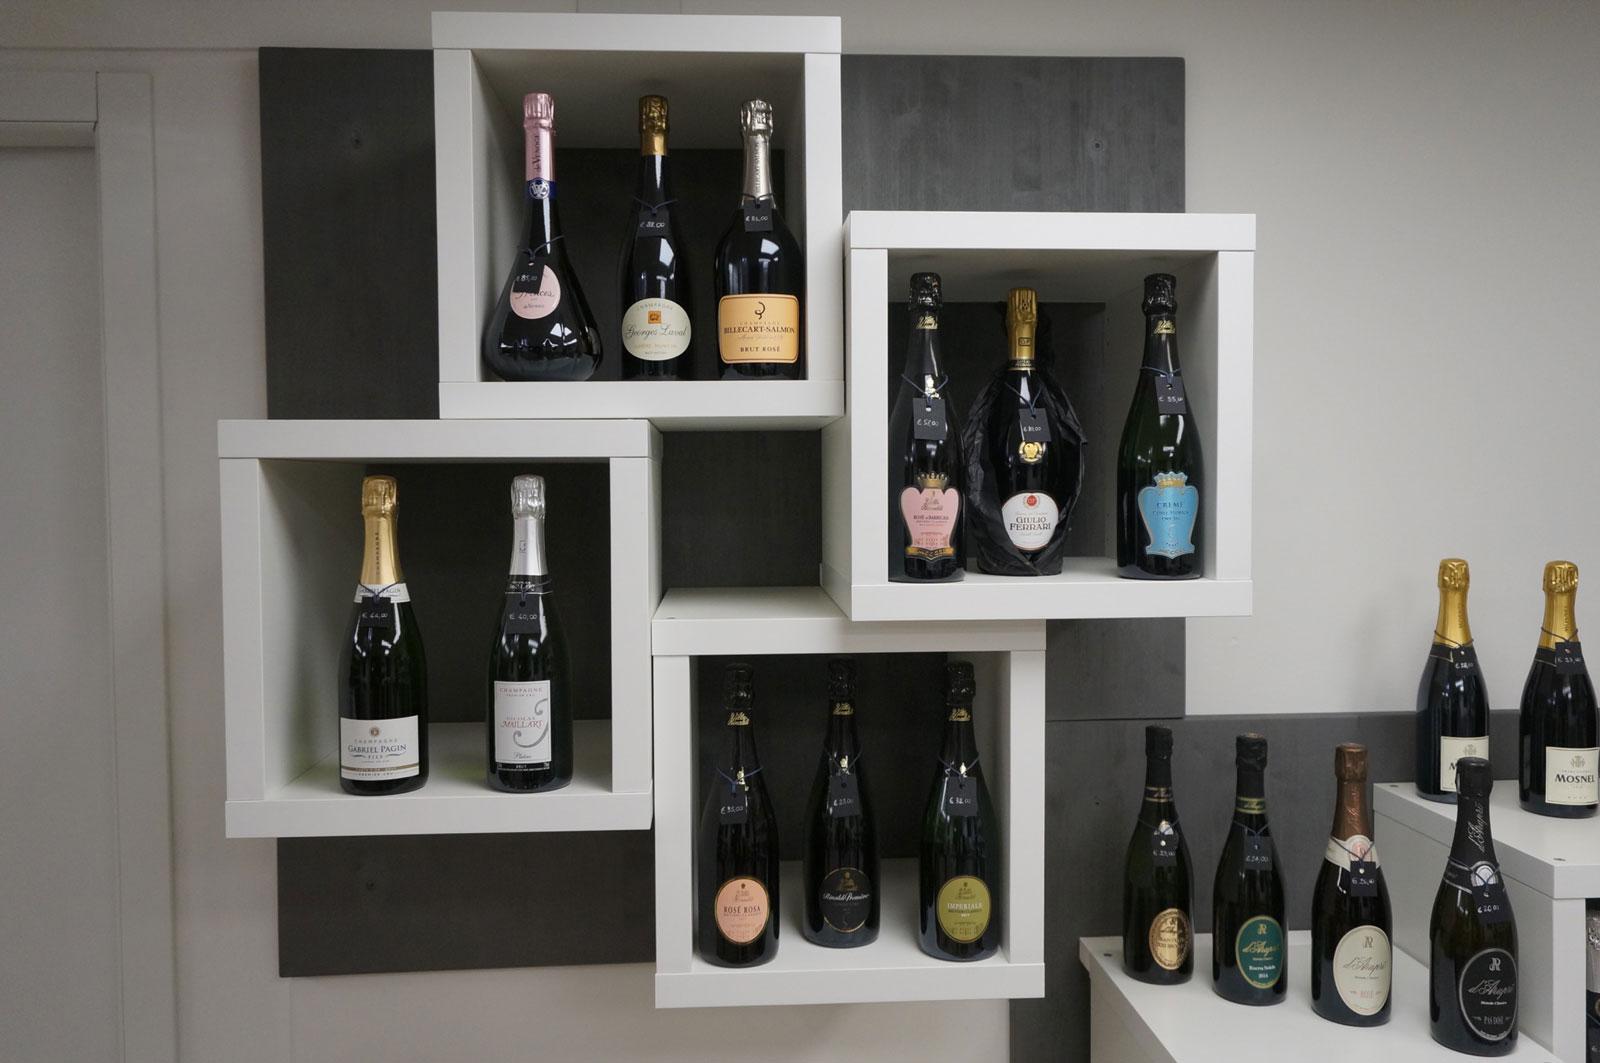 botrytis enoteca vini bottiglie